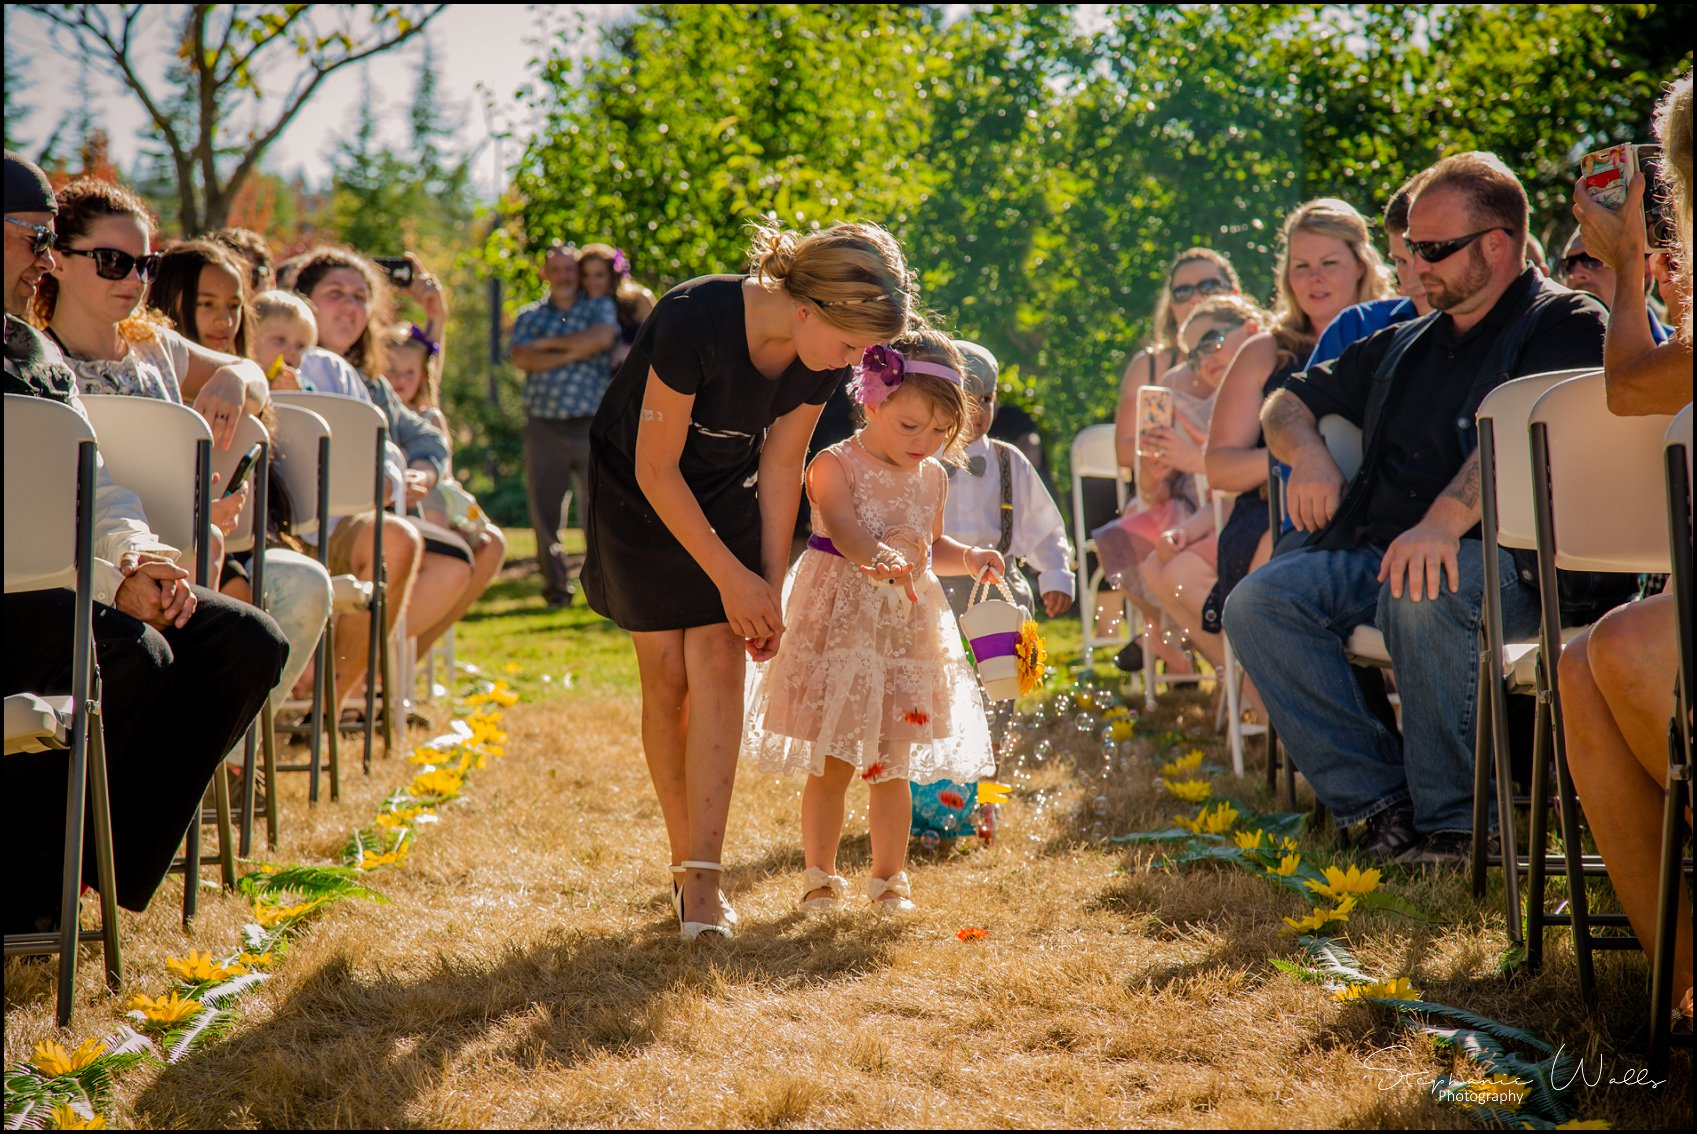 Everist Wedding 113 Patti & Bobbys | Troll Haven Castle & Bandy Farms | Sequim, Wa Wedding Photographer